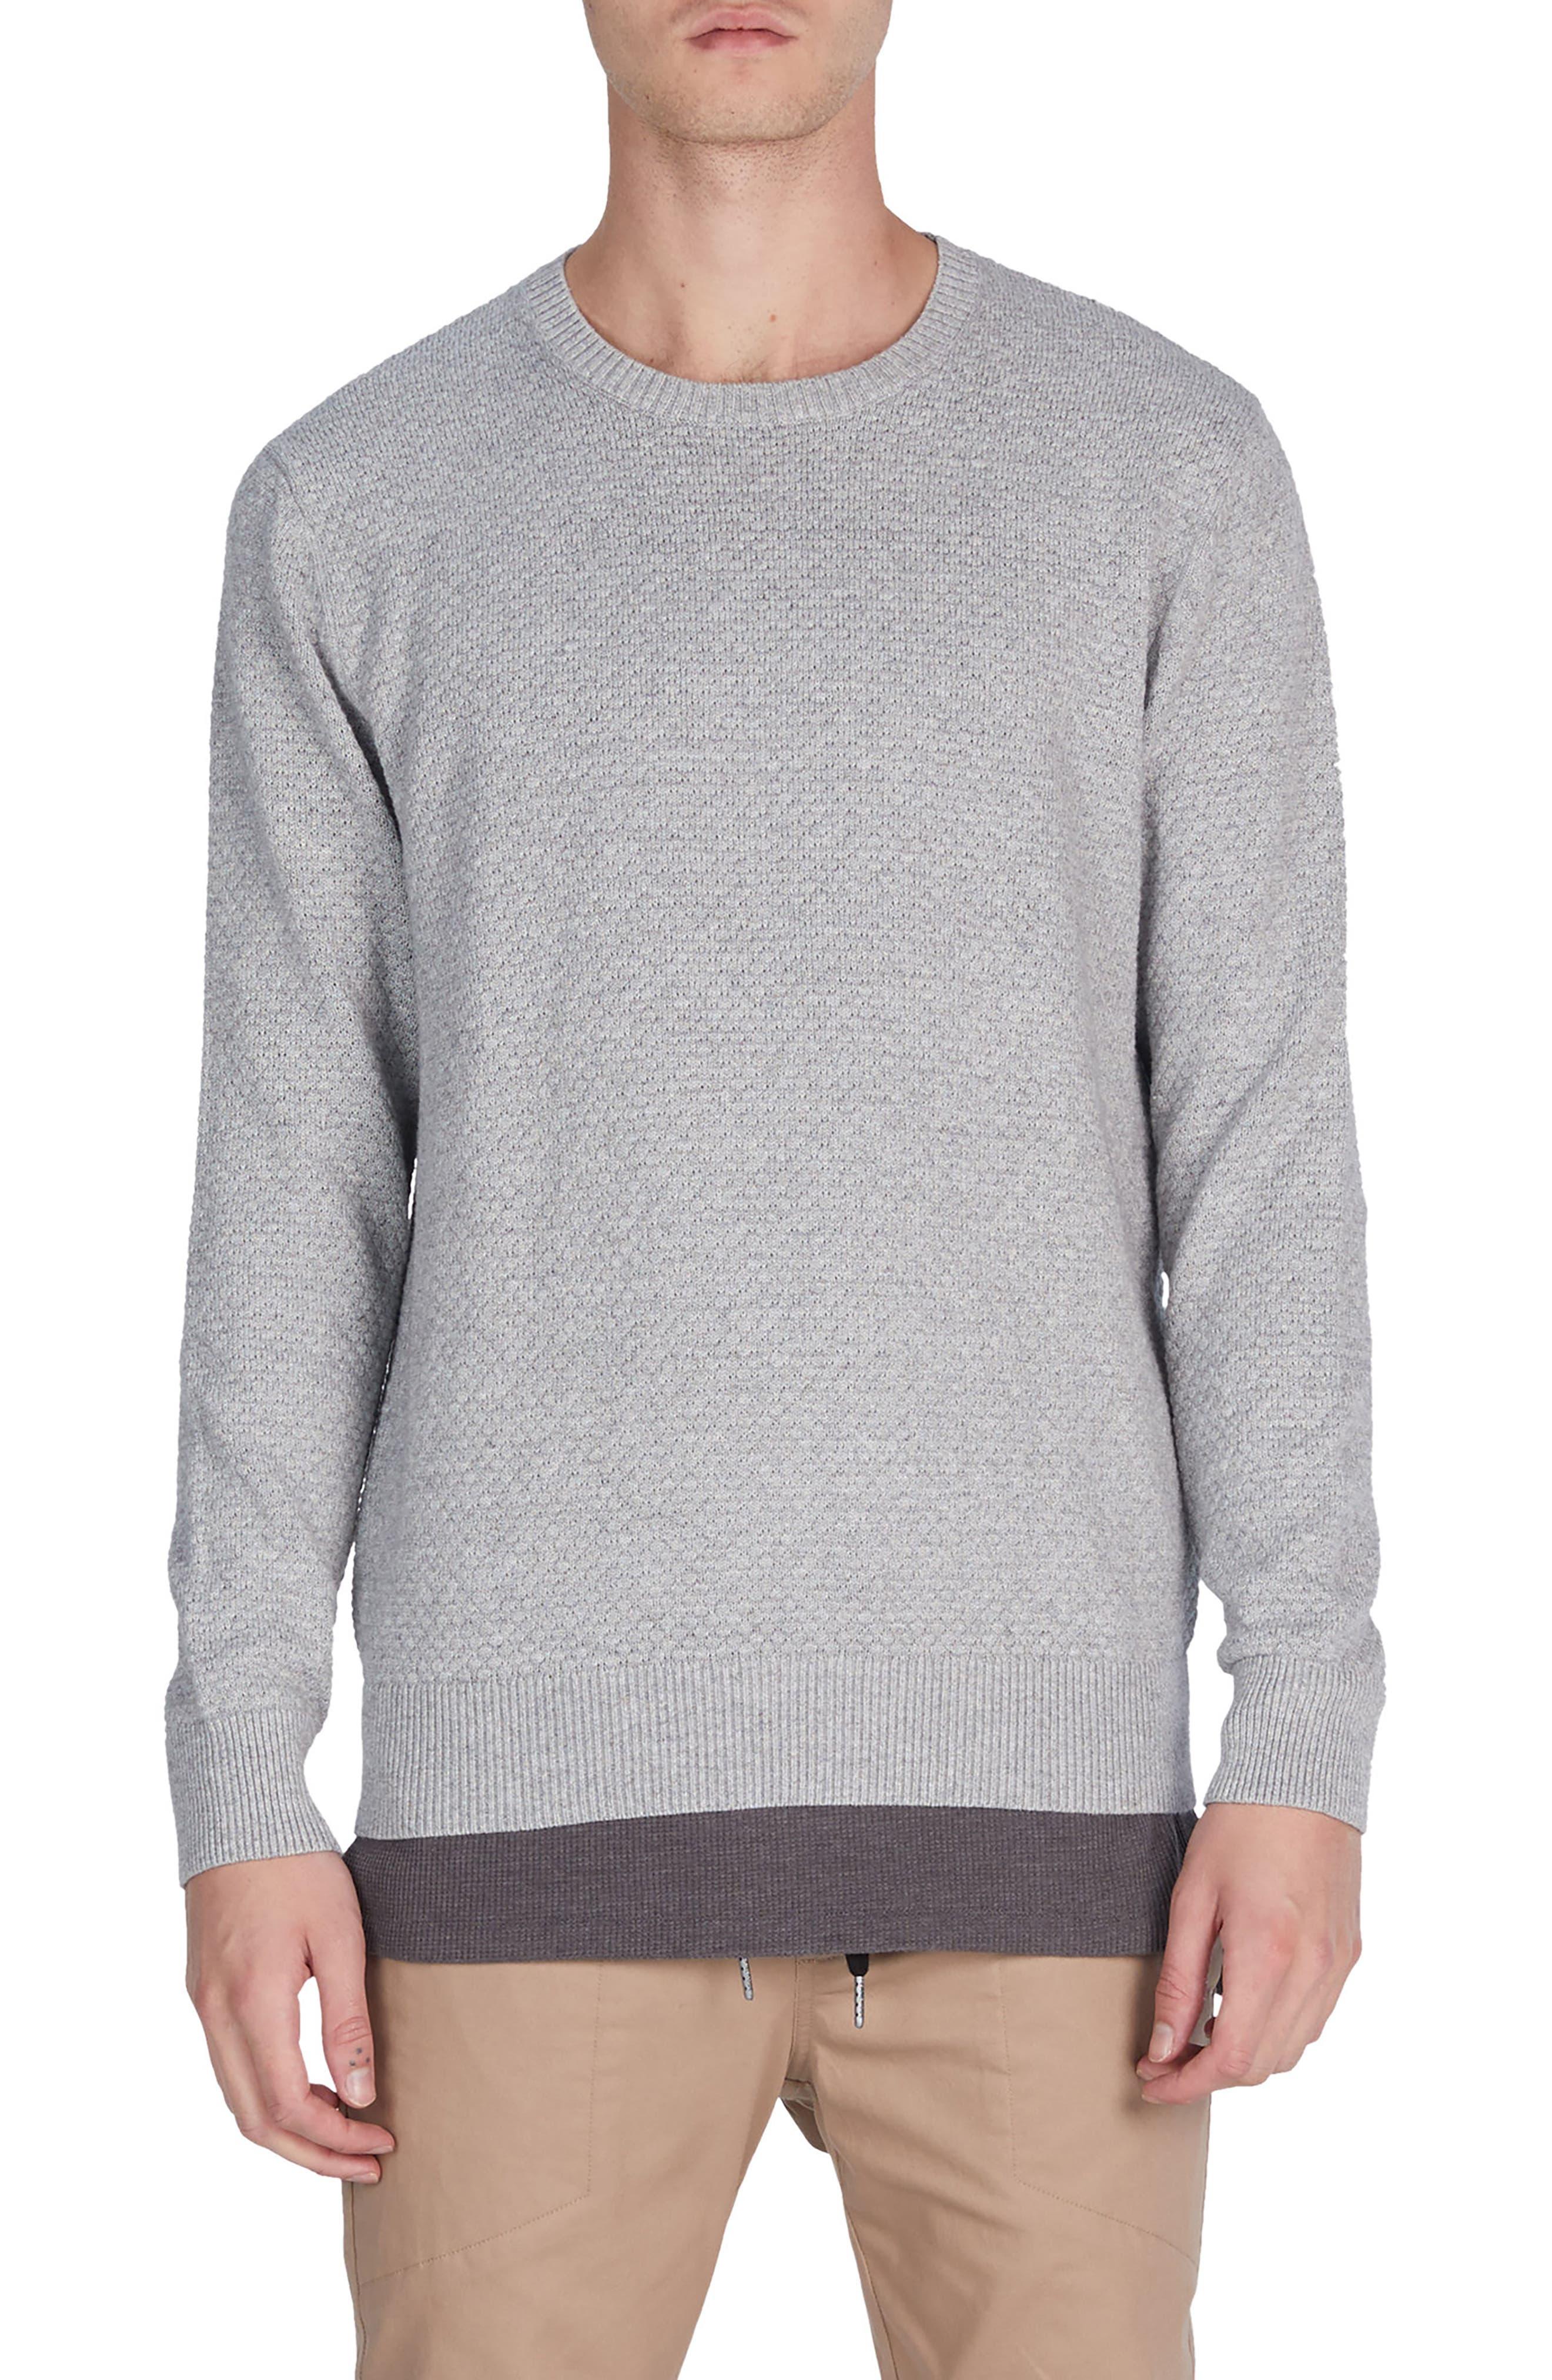 Main Image - ZANEROBE Grip Crewneck Sweater